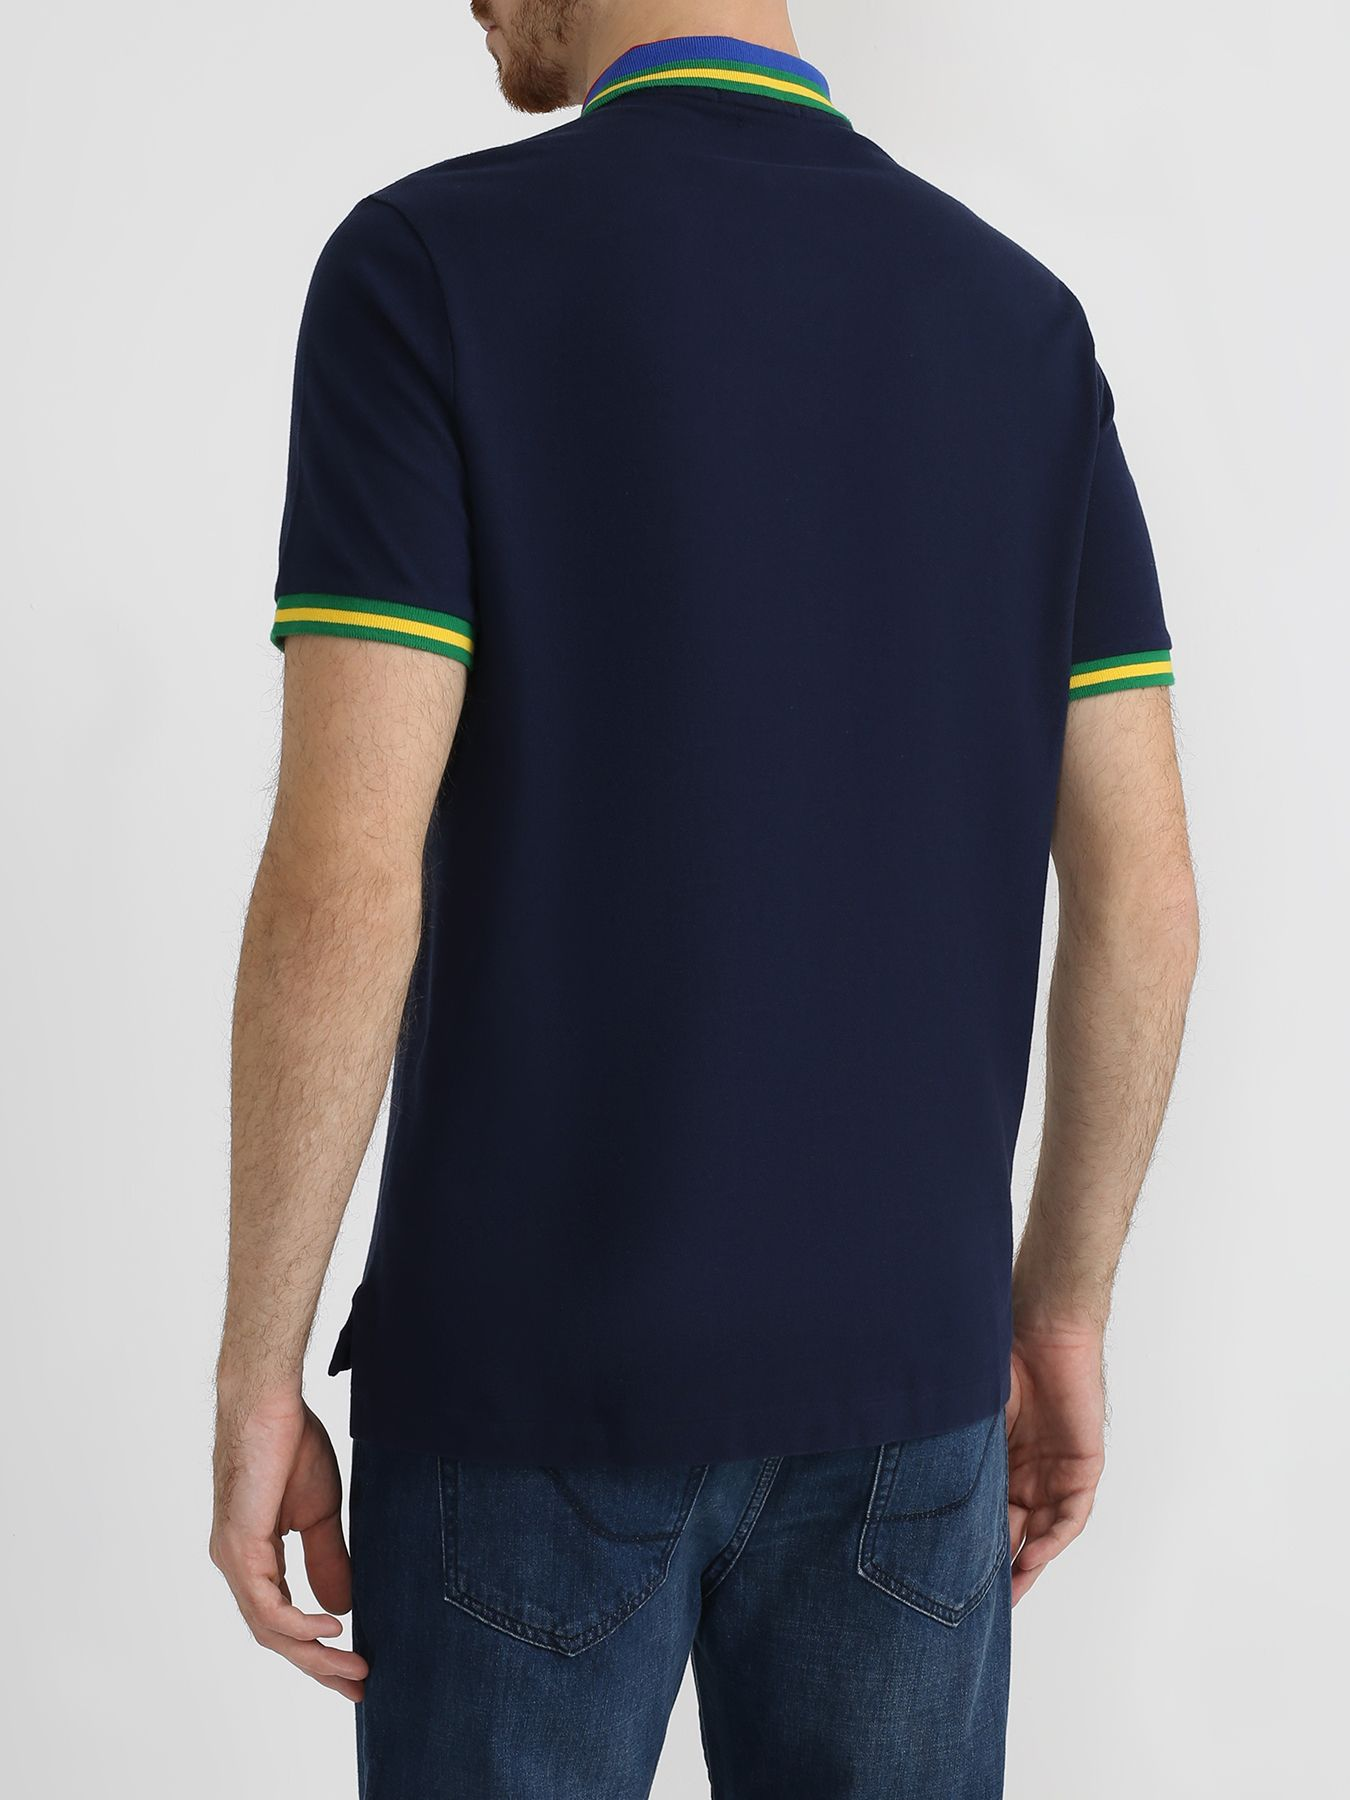 Polo Ralph Lauren Поло с полосками на воротнике 329212-046 Фото 2